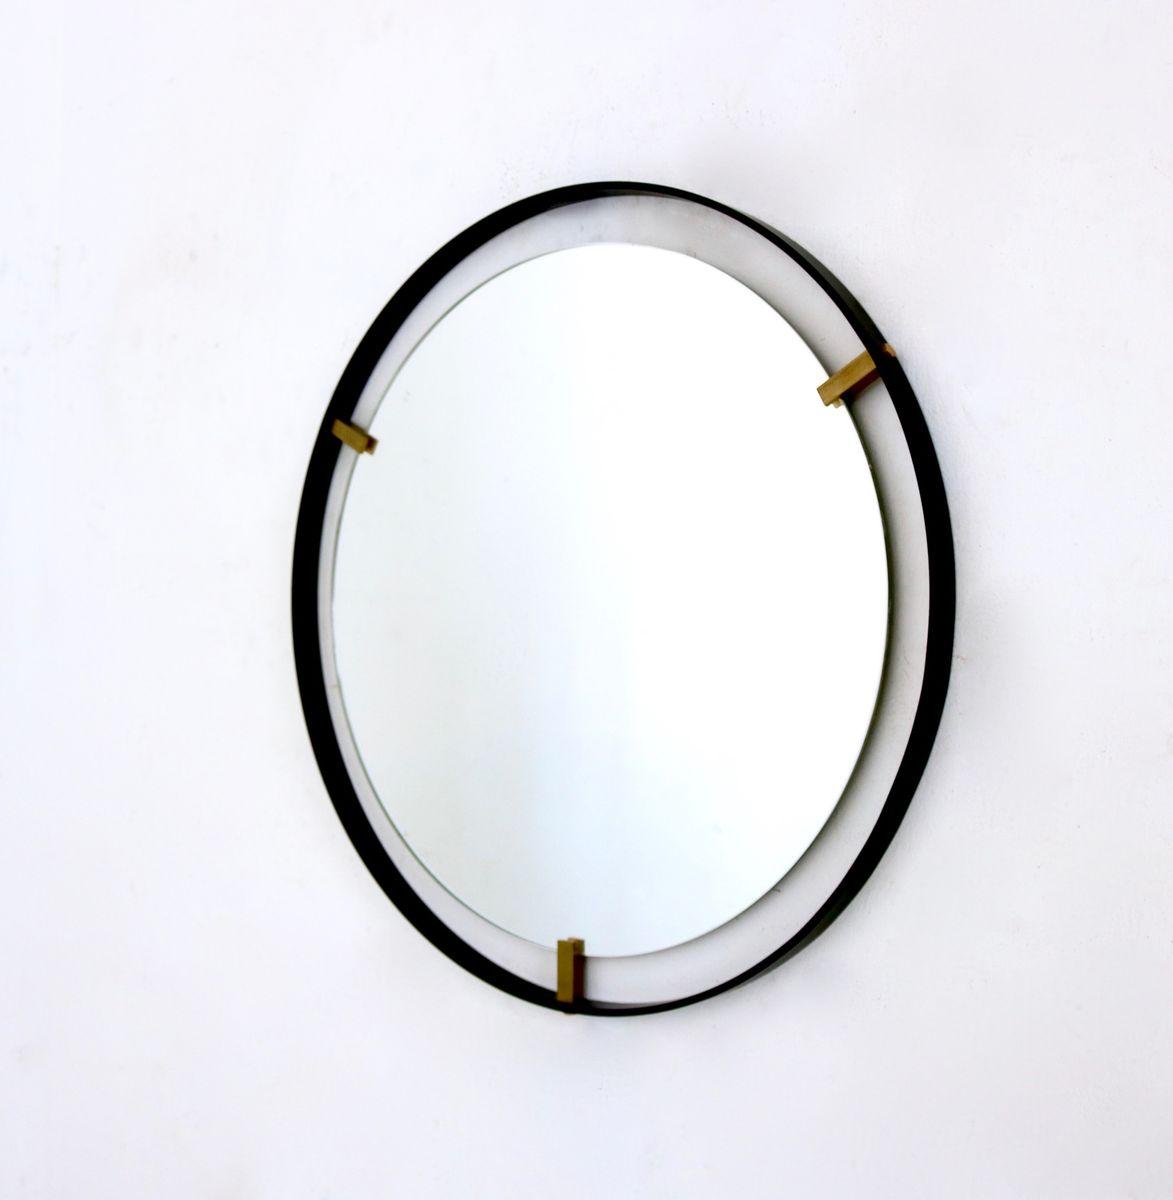 Italian Minimalist Mirrors 1950s Set Of 2 For Sale At Pamono